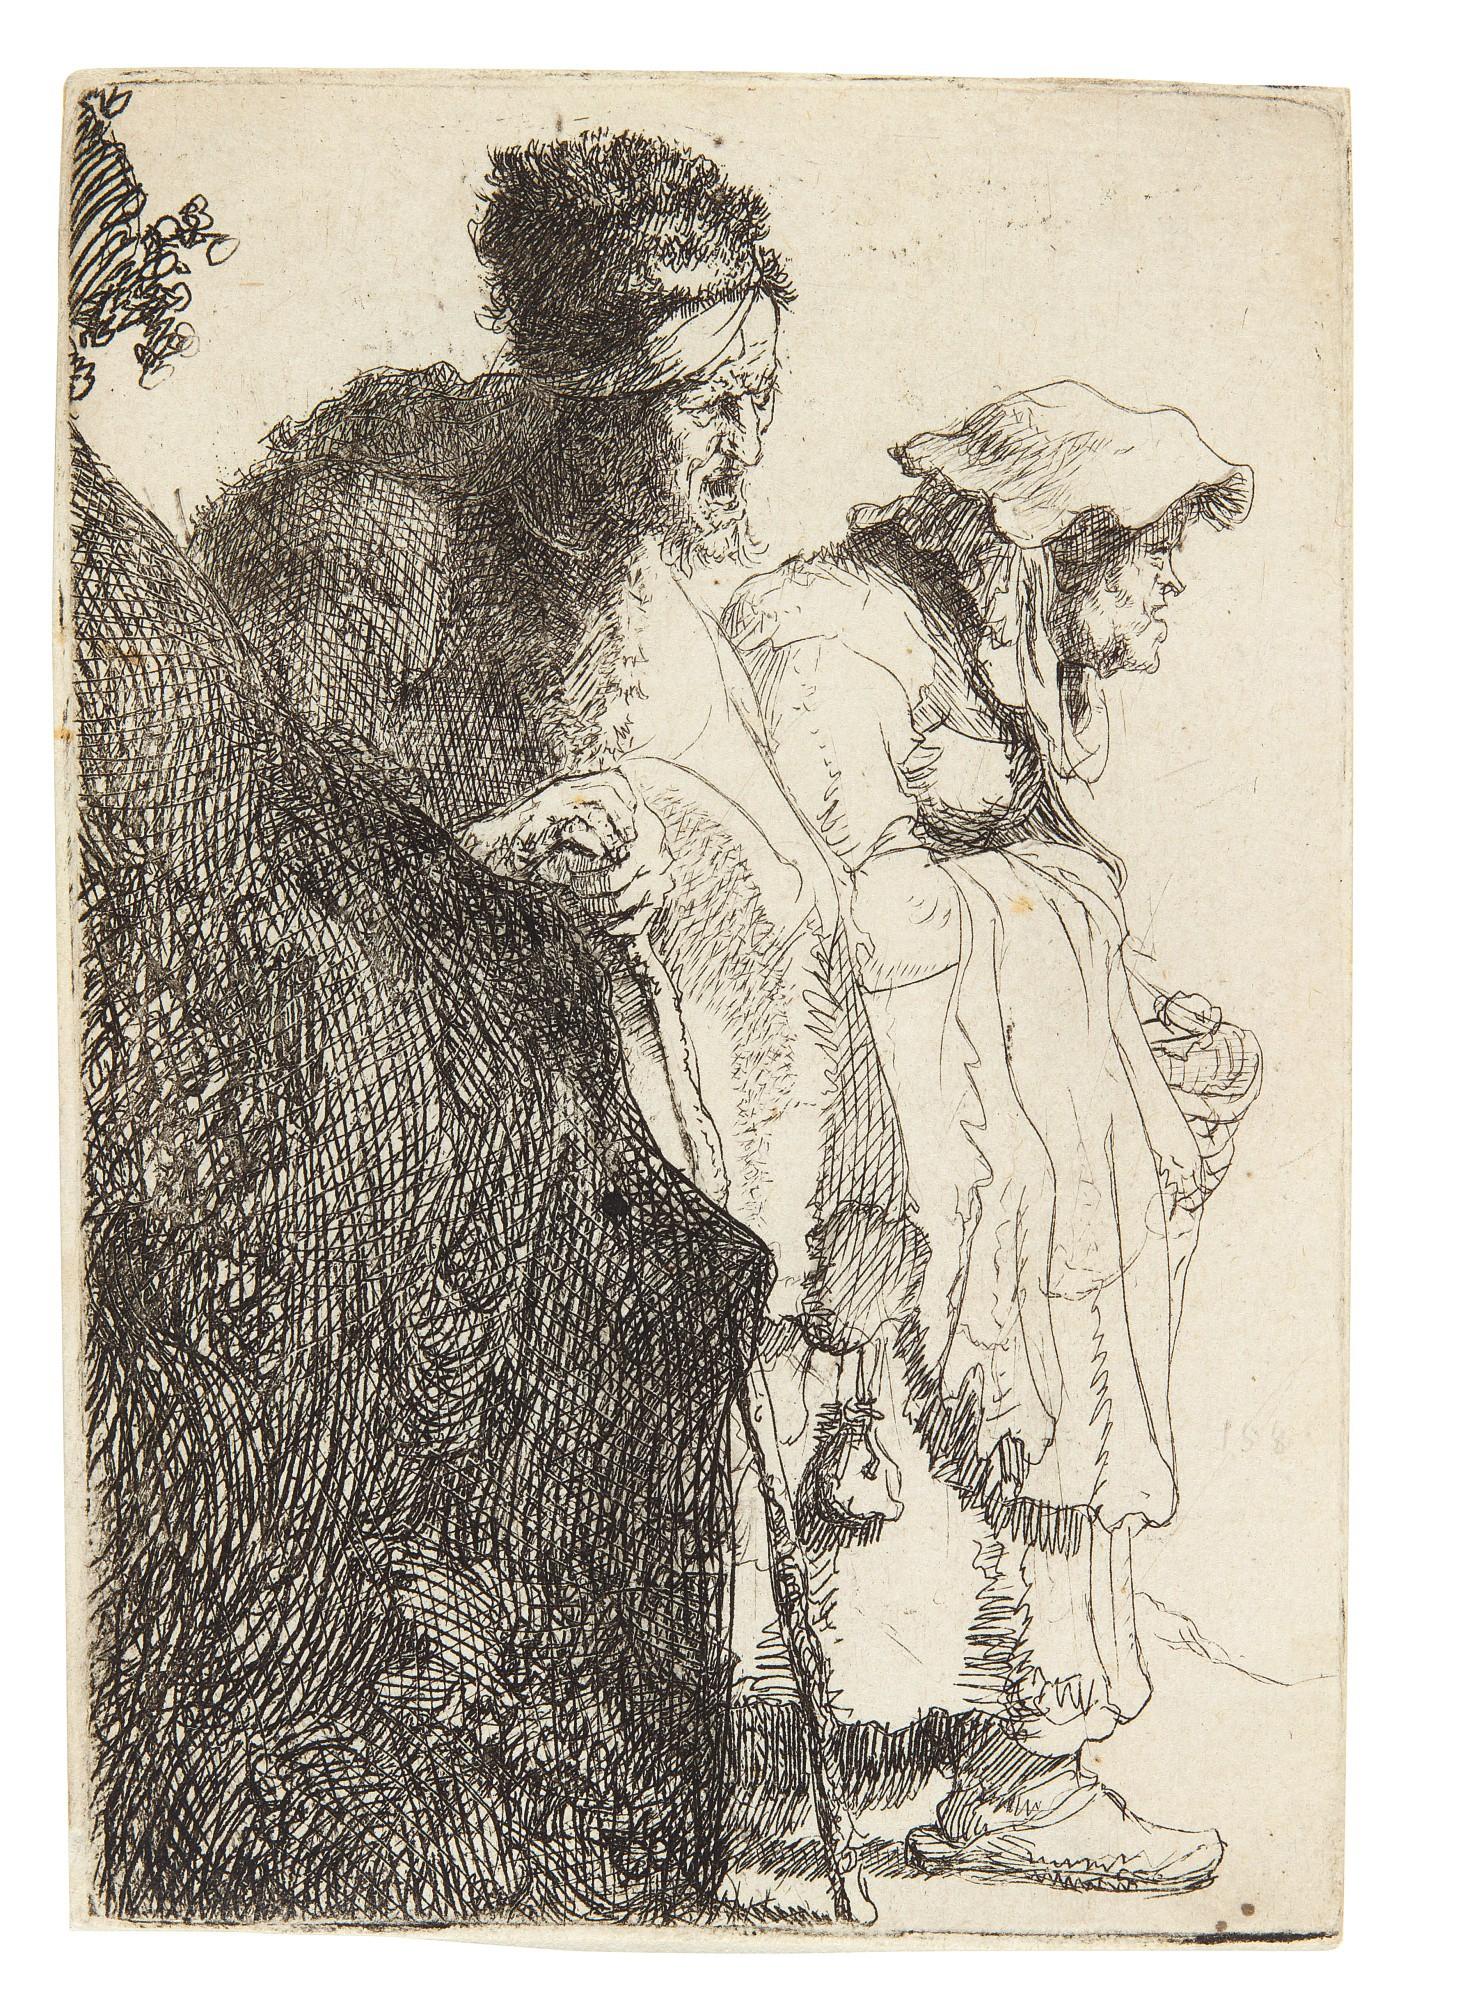 REMBRANDT HARMENSZ. VAN RIJN | BEGGAR MAN AND WOMAN BEHIND A BANK (B., HOLL. 165; NEW HOLL. 51; H. 13)